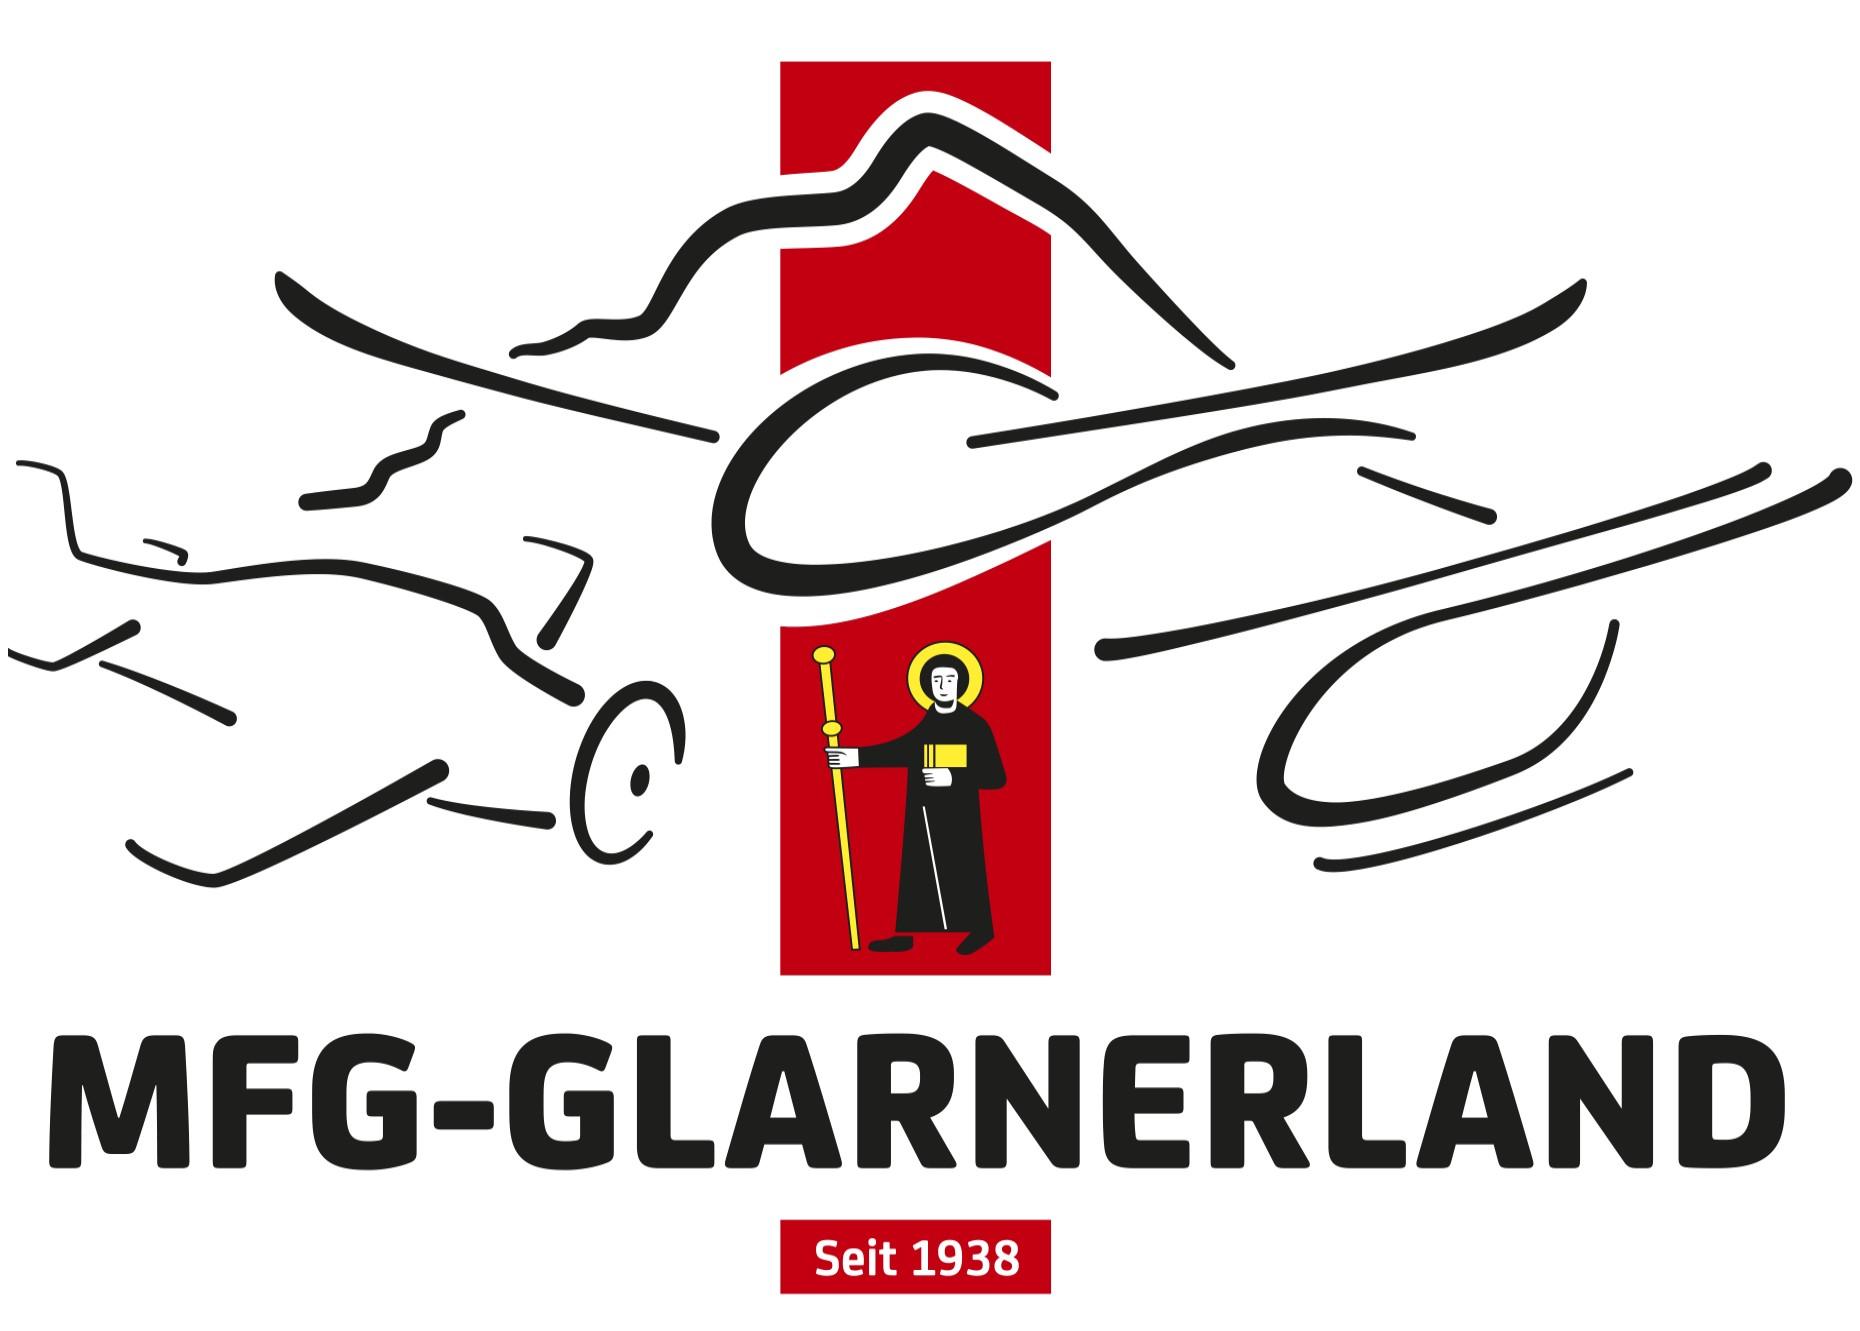 Modellfluggruppe Glarnerland